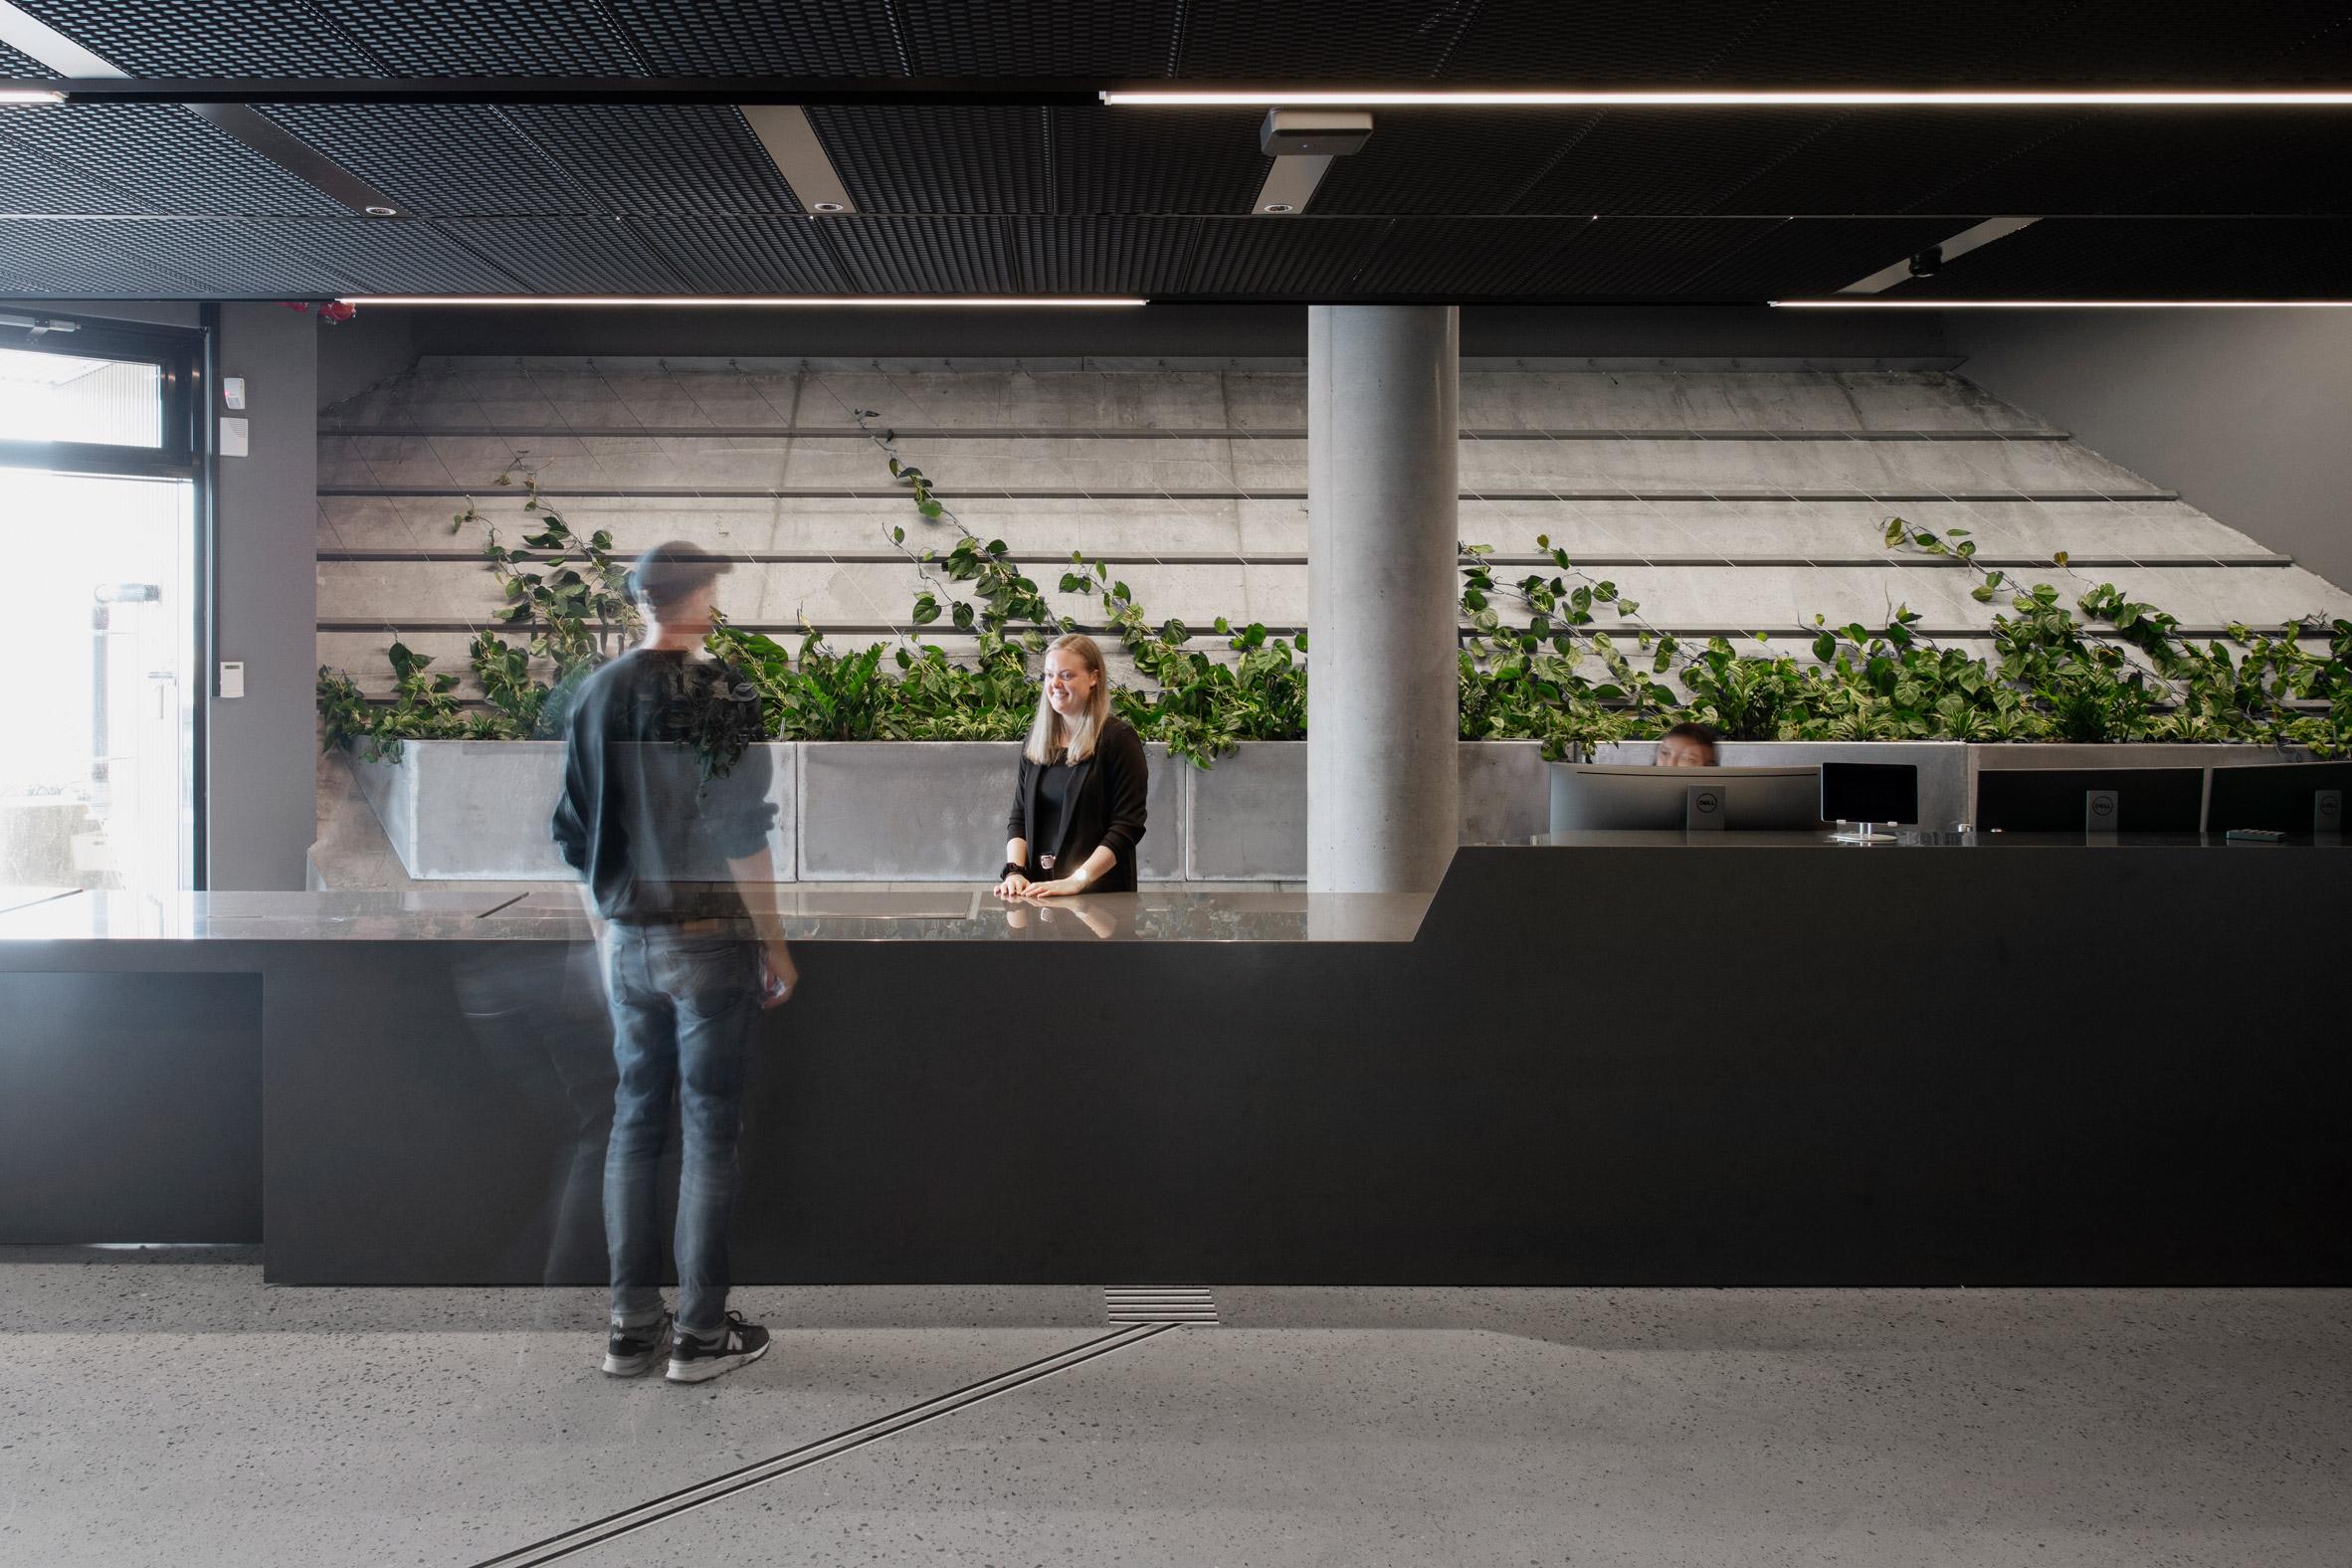 Powerhouse Brattørkaia sustainable office building in Tronheim by Snøhetta